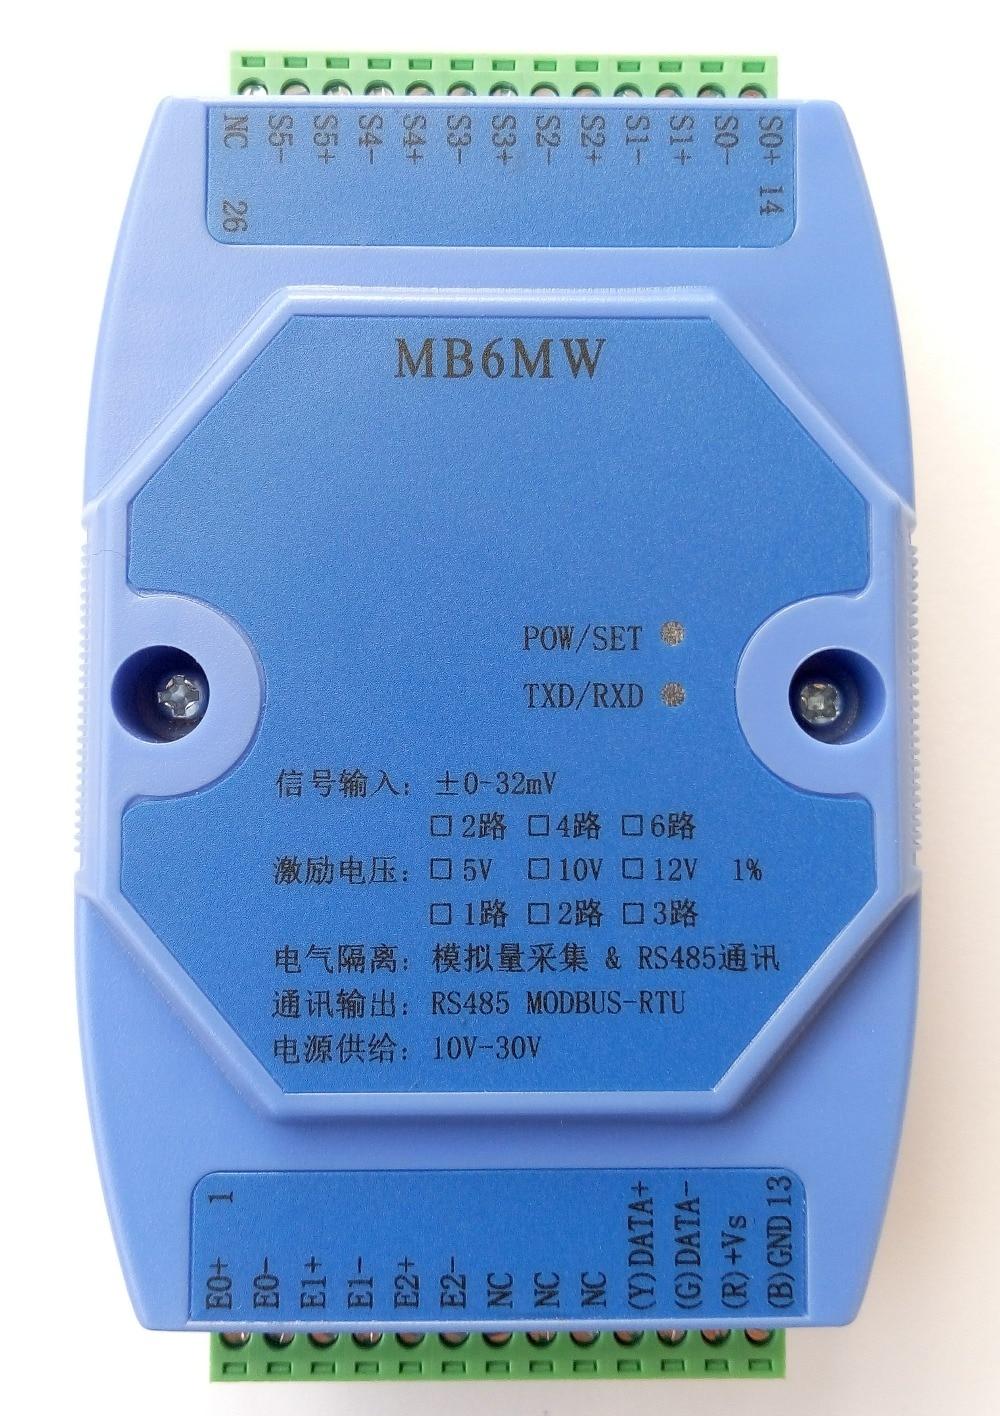 все цены на  Weighing sensor 6 road weighing module RTU Modbus protocol 485 weighing module weighing transmitter  онлайн